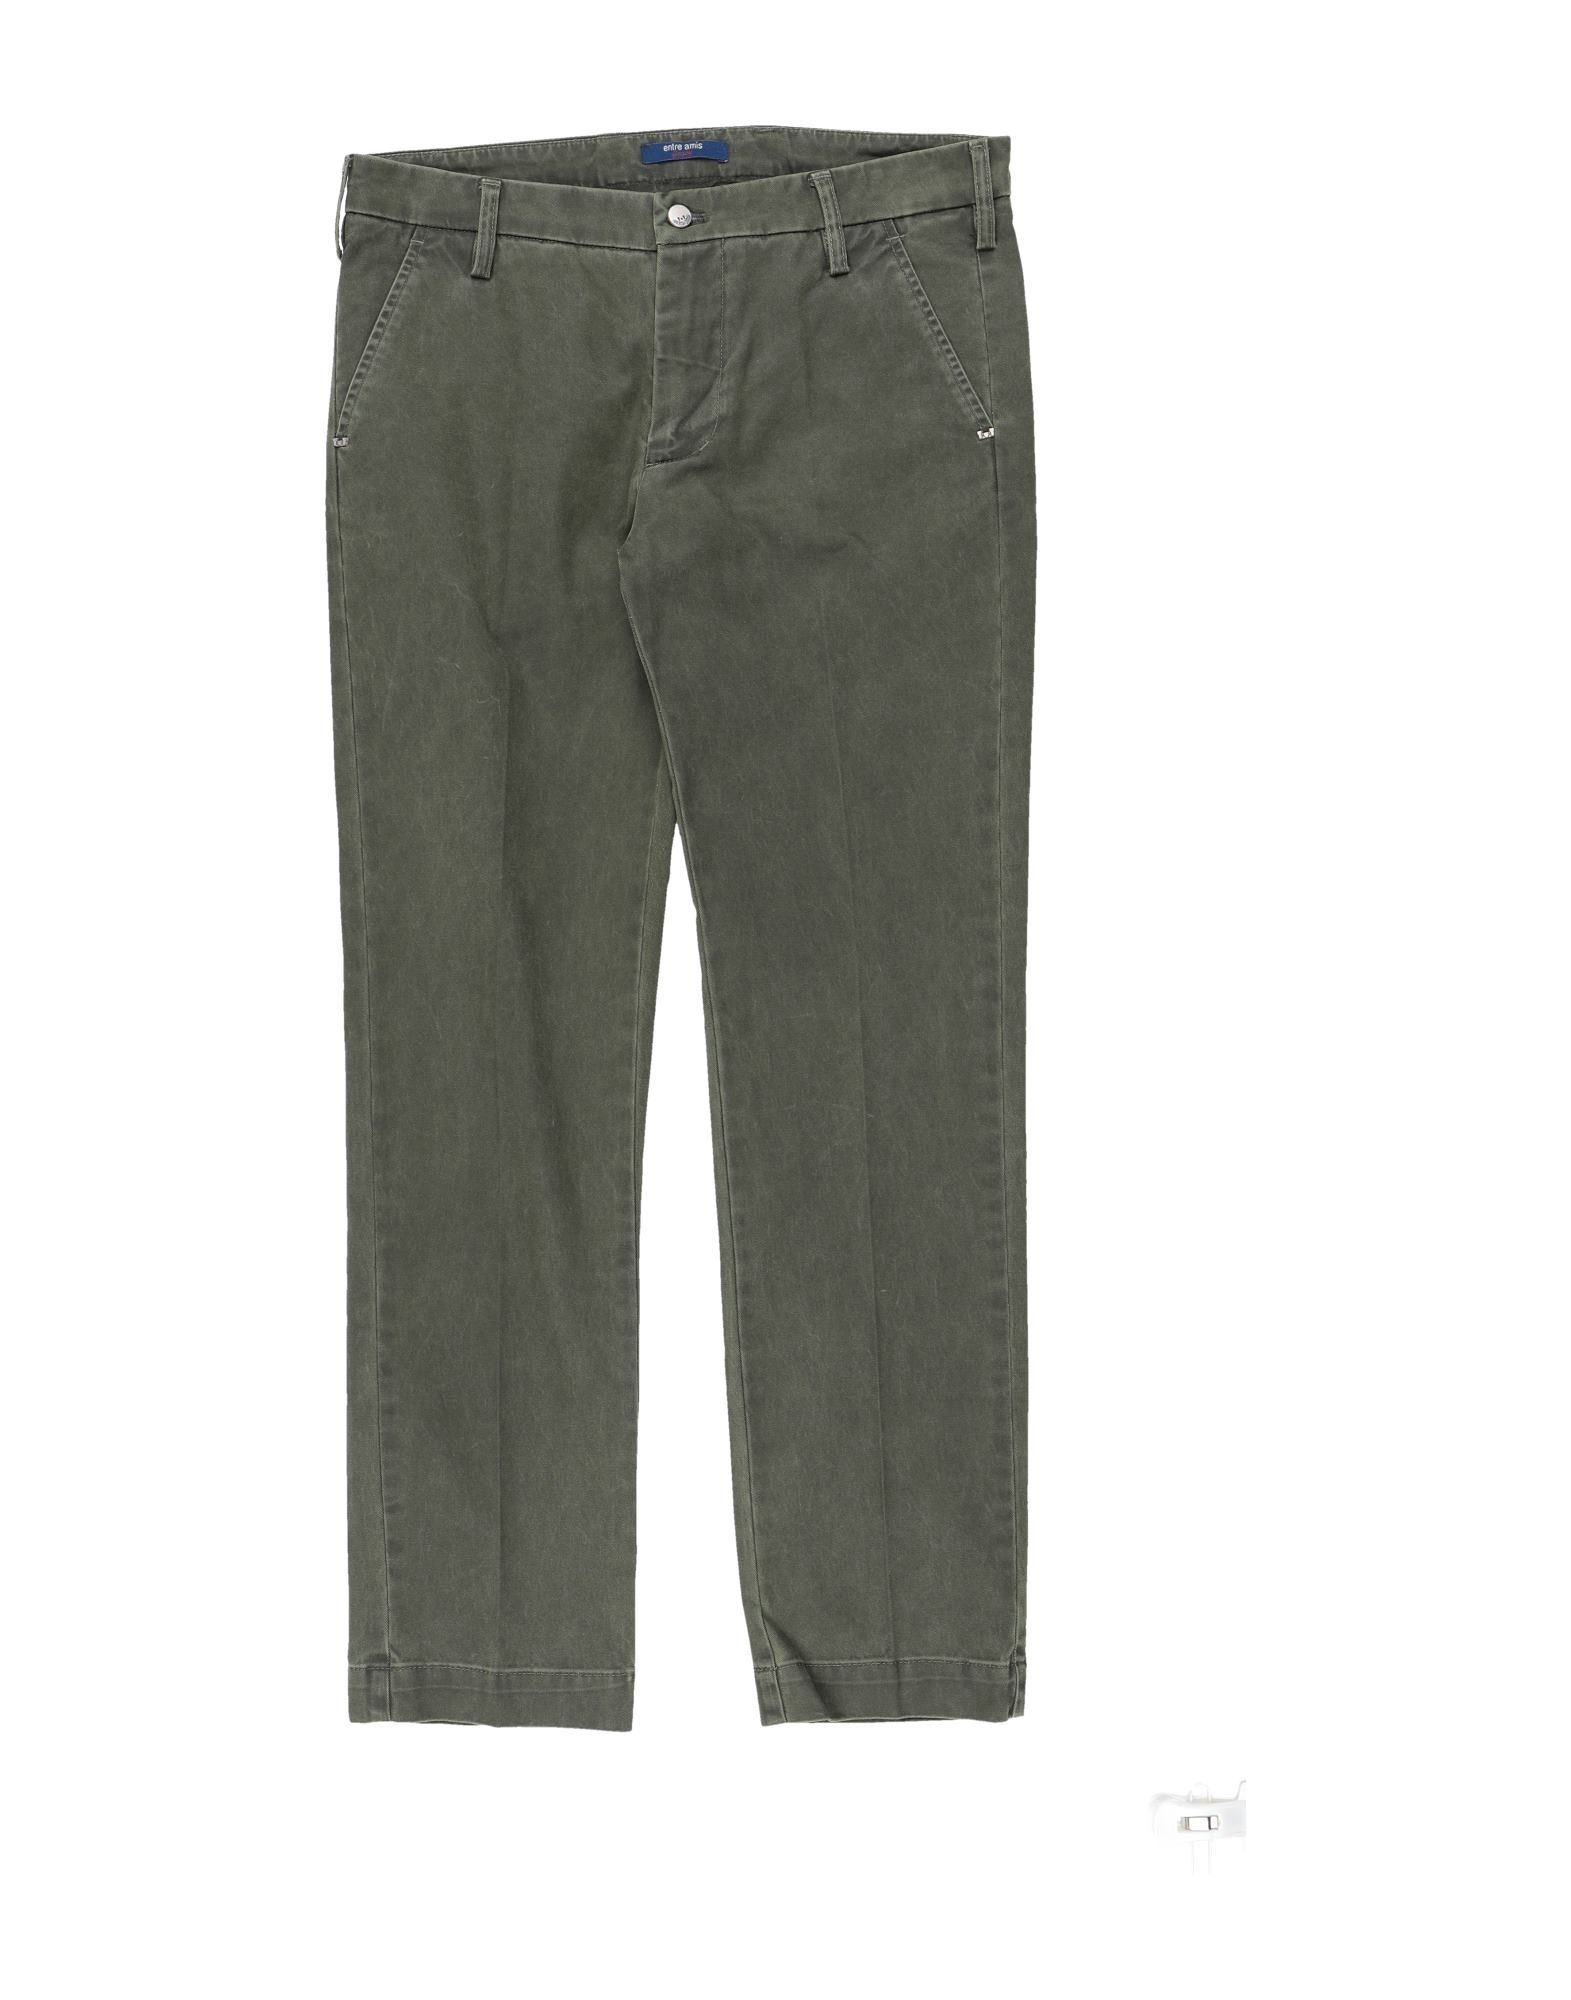 Entre Amis Garçon Kids' Casual Pants In Military Green